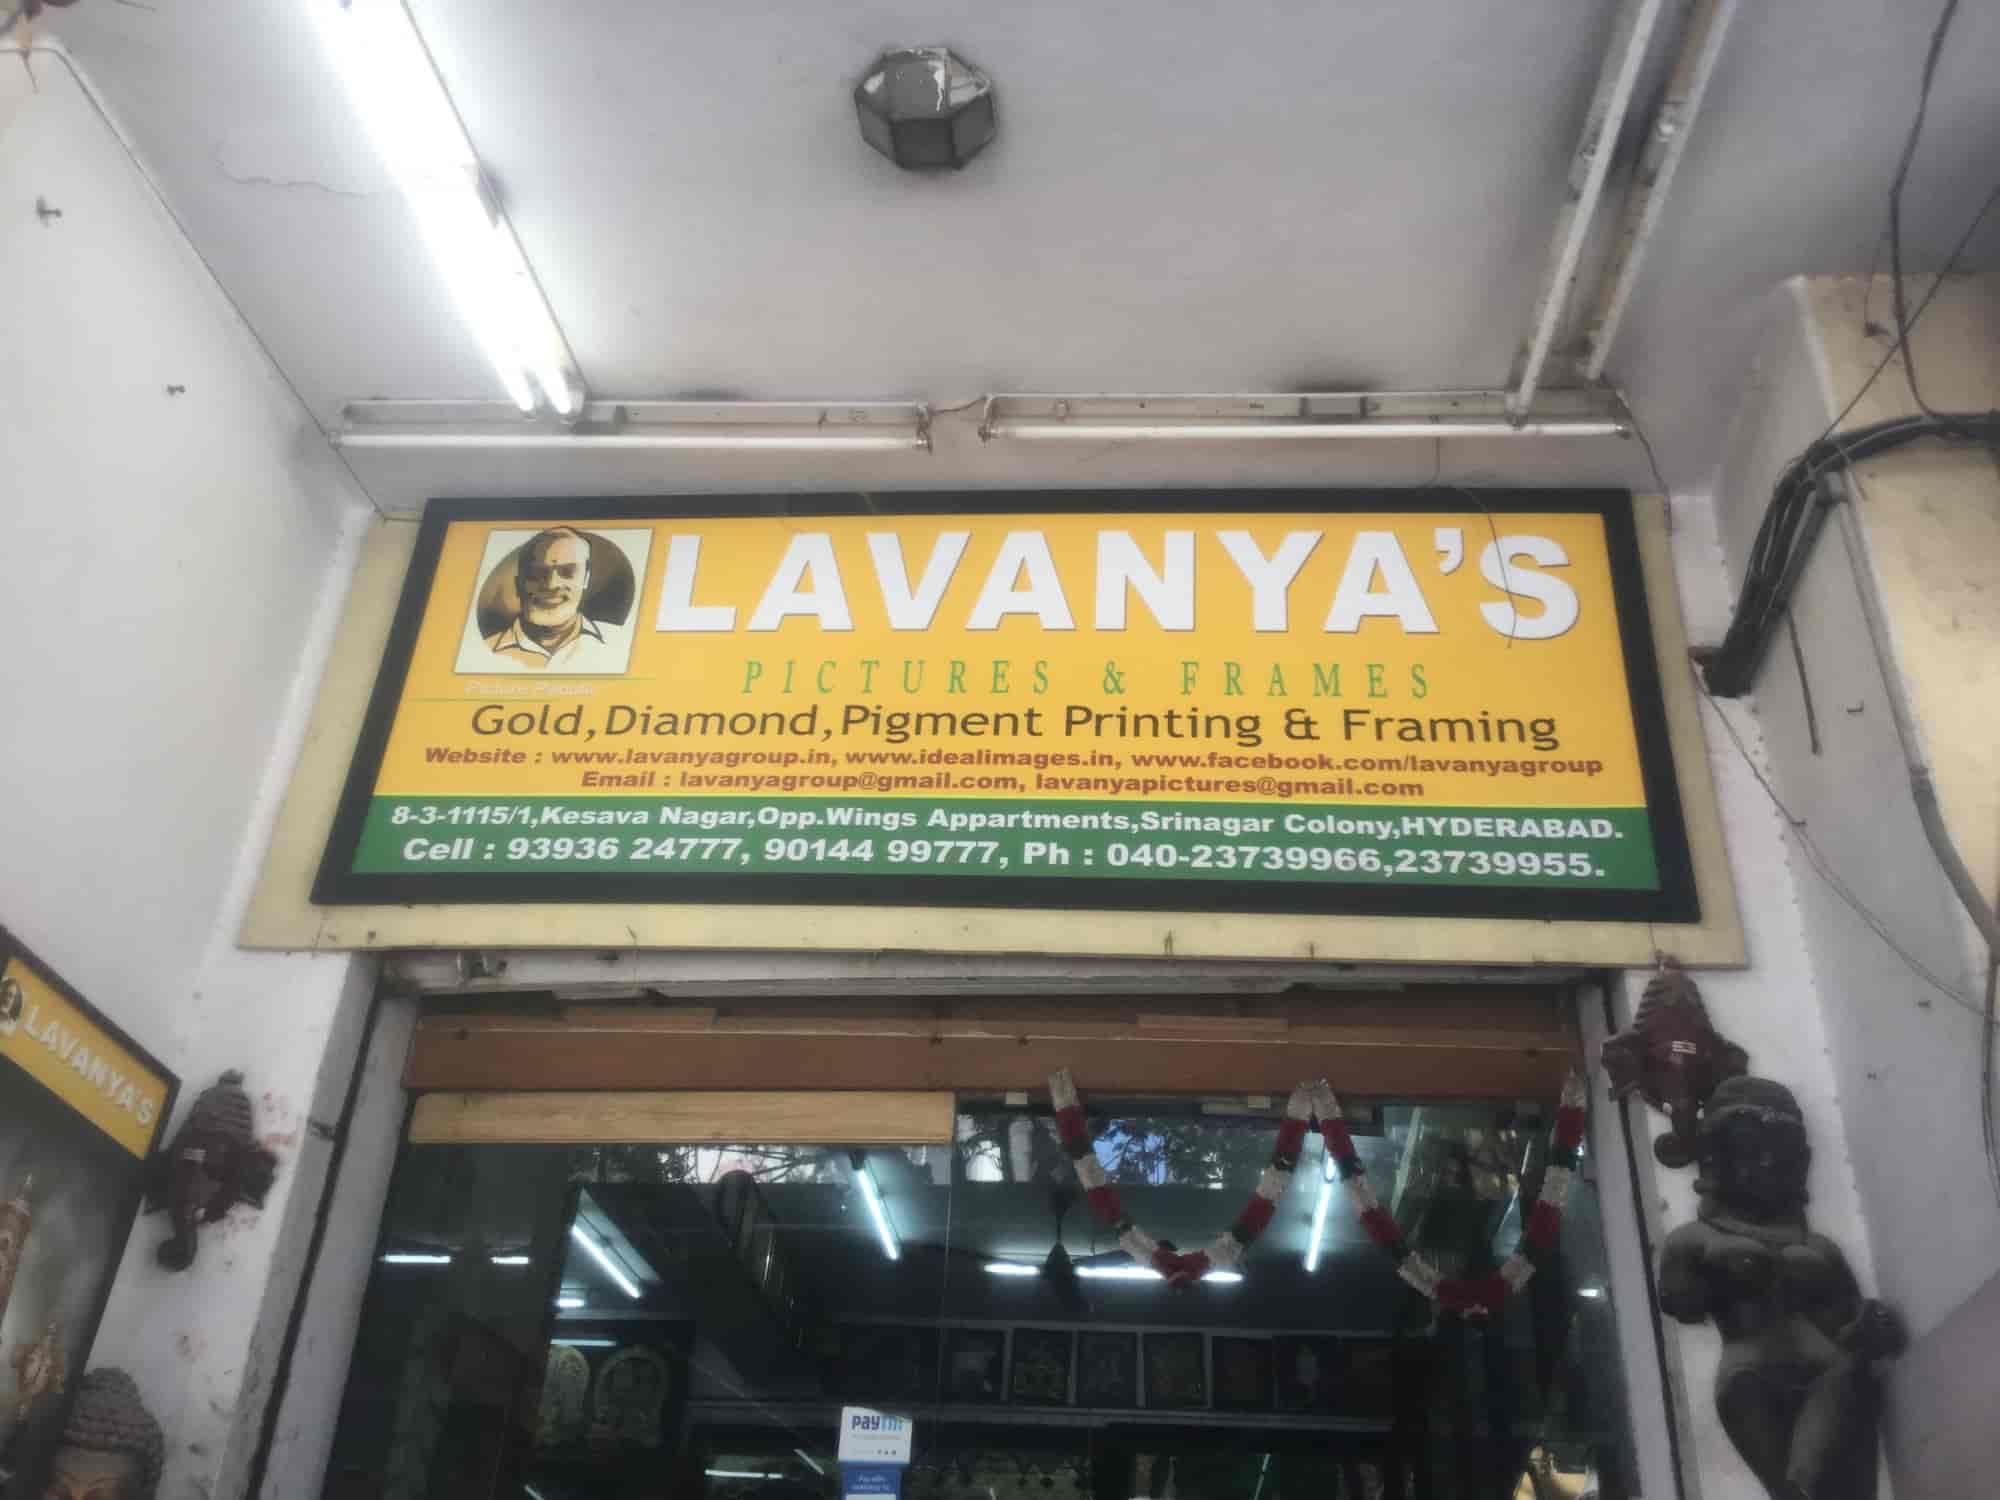 Lavanya's Pictures And Frames, Sri Nagar Colony - Photo